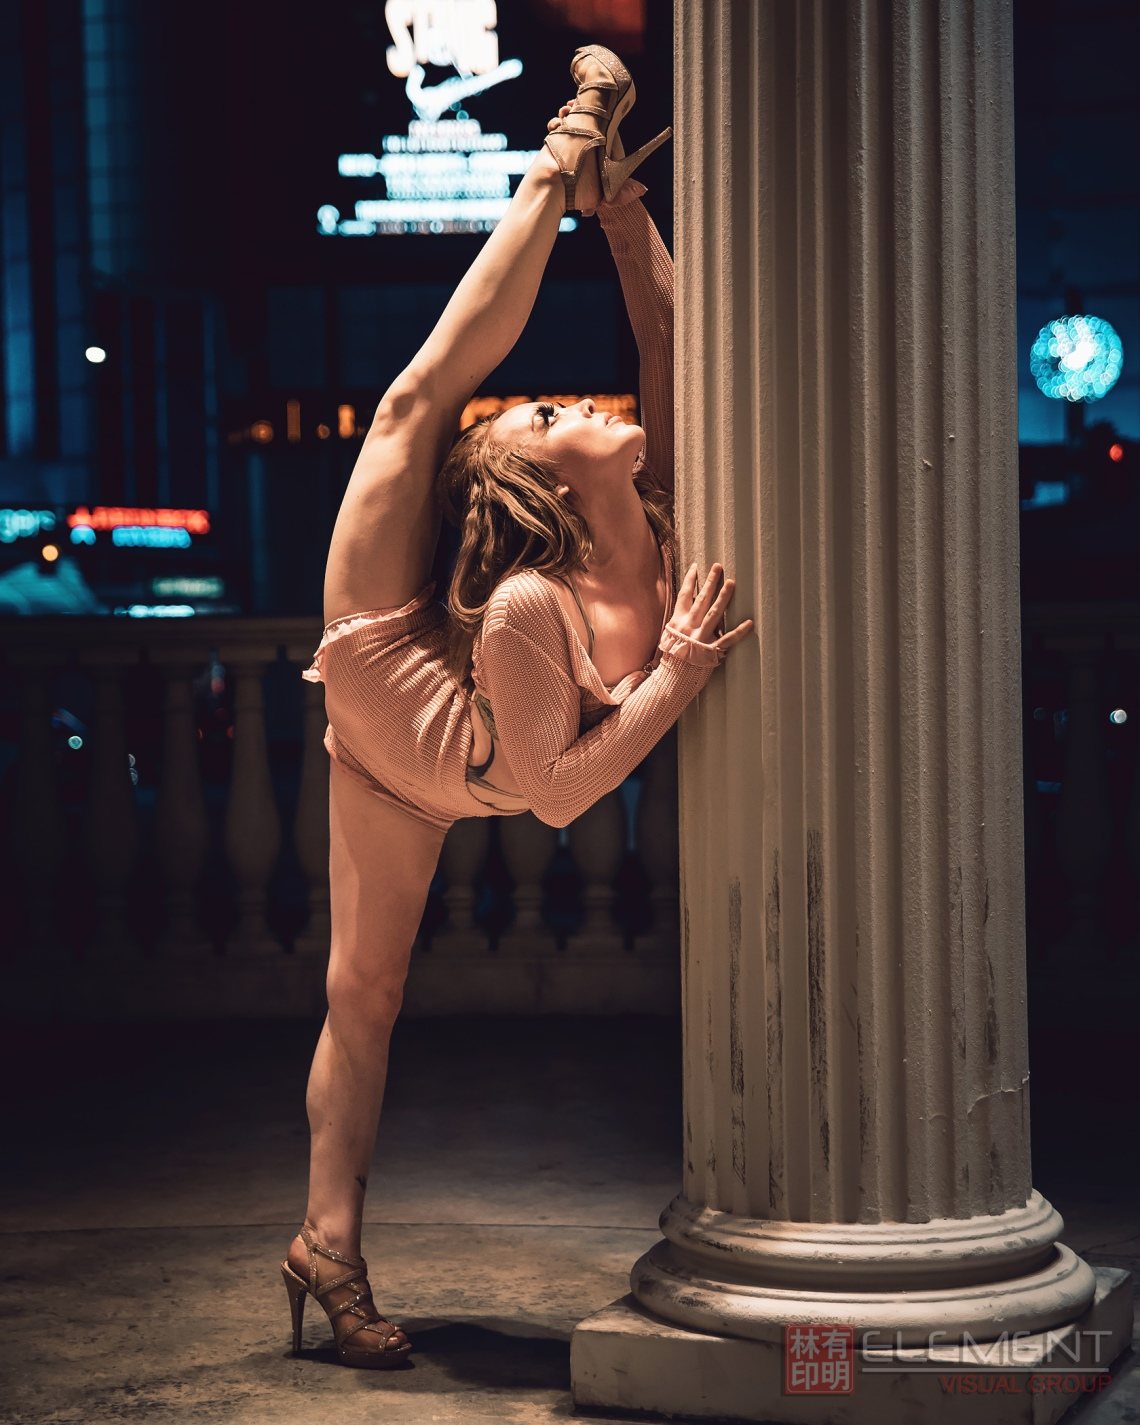 Contortionist, contortion, contortion training, contortion pictures, contortionism, gymnastics training, rhythmic gymnastics, home stretching, back flexibility, how to get flexible, upper back stretches, contortion lessons, back stretches, personal training, flexibility goals, bodysuits, body suits, leotards, contortion pictures, circus training, Las Vegas contortion, splits, Caesars Palace, las Vegas strip, travel Las Vegas,